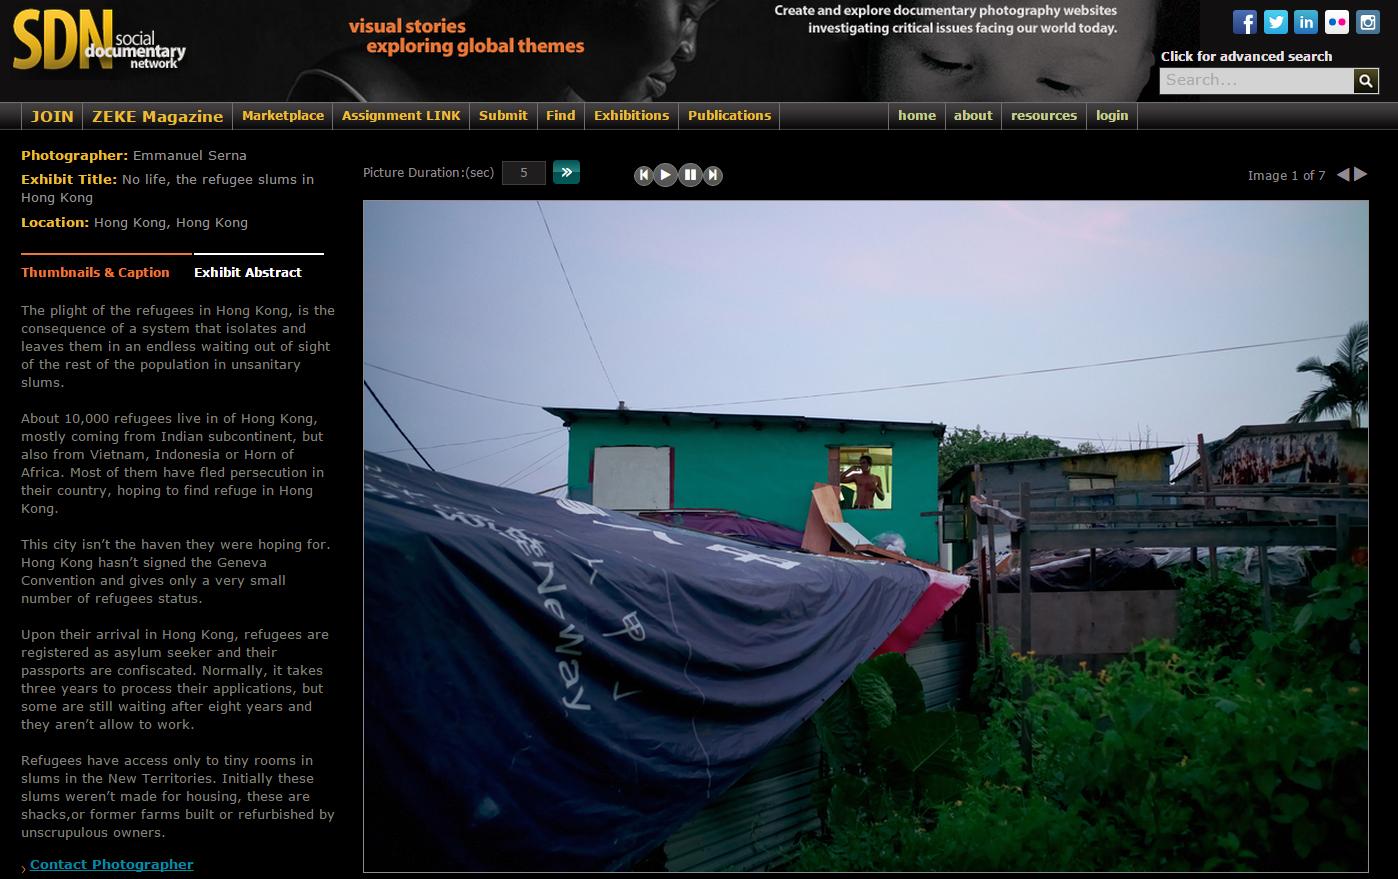 No life, the refugee slums in Hong Kong